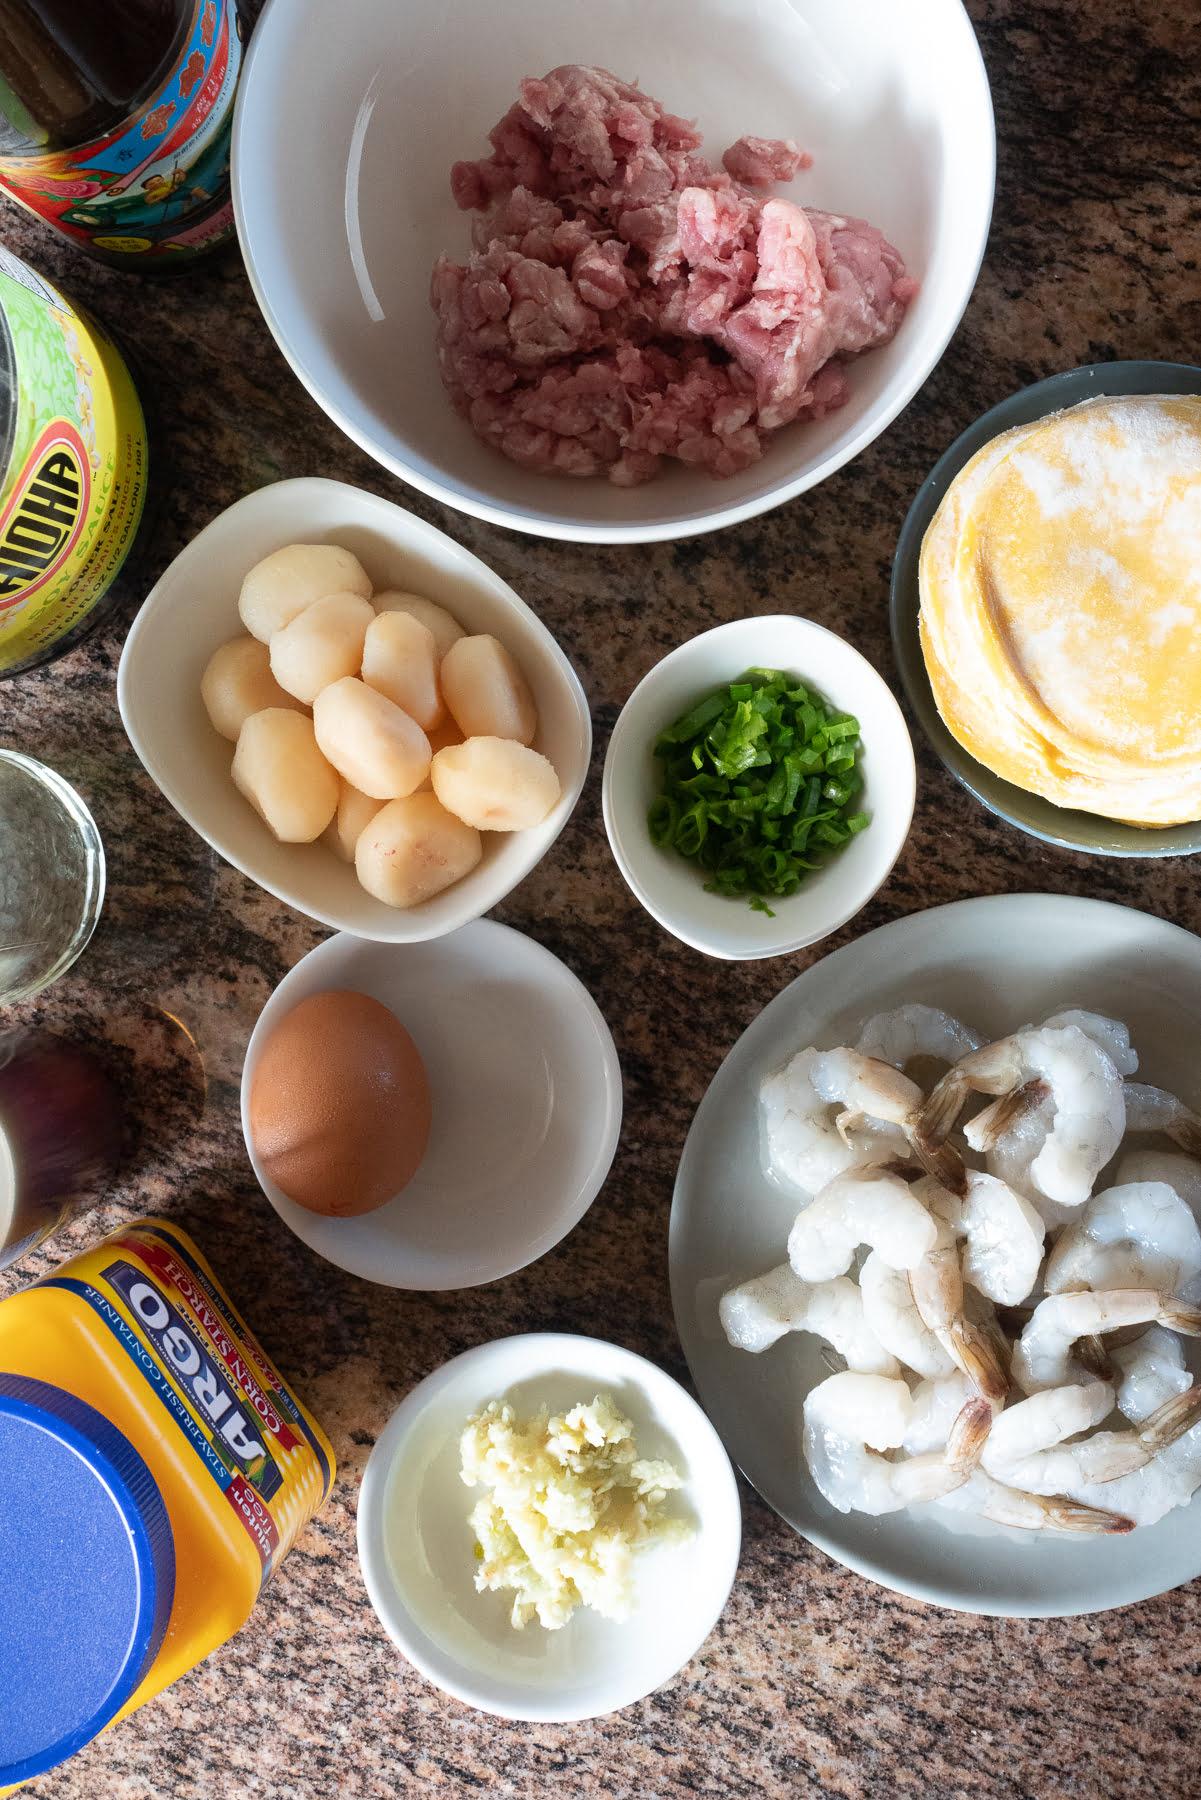 Ingredients for Pork Hash (ground pork, shrimp, egg, water chestnuts, green onions, garlic, cornstarch, soy sauce, oyster sauce, sesame oil, white pepper, and round dumpling skins).